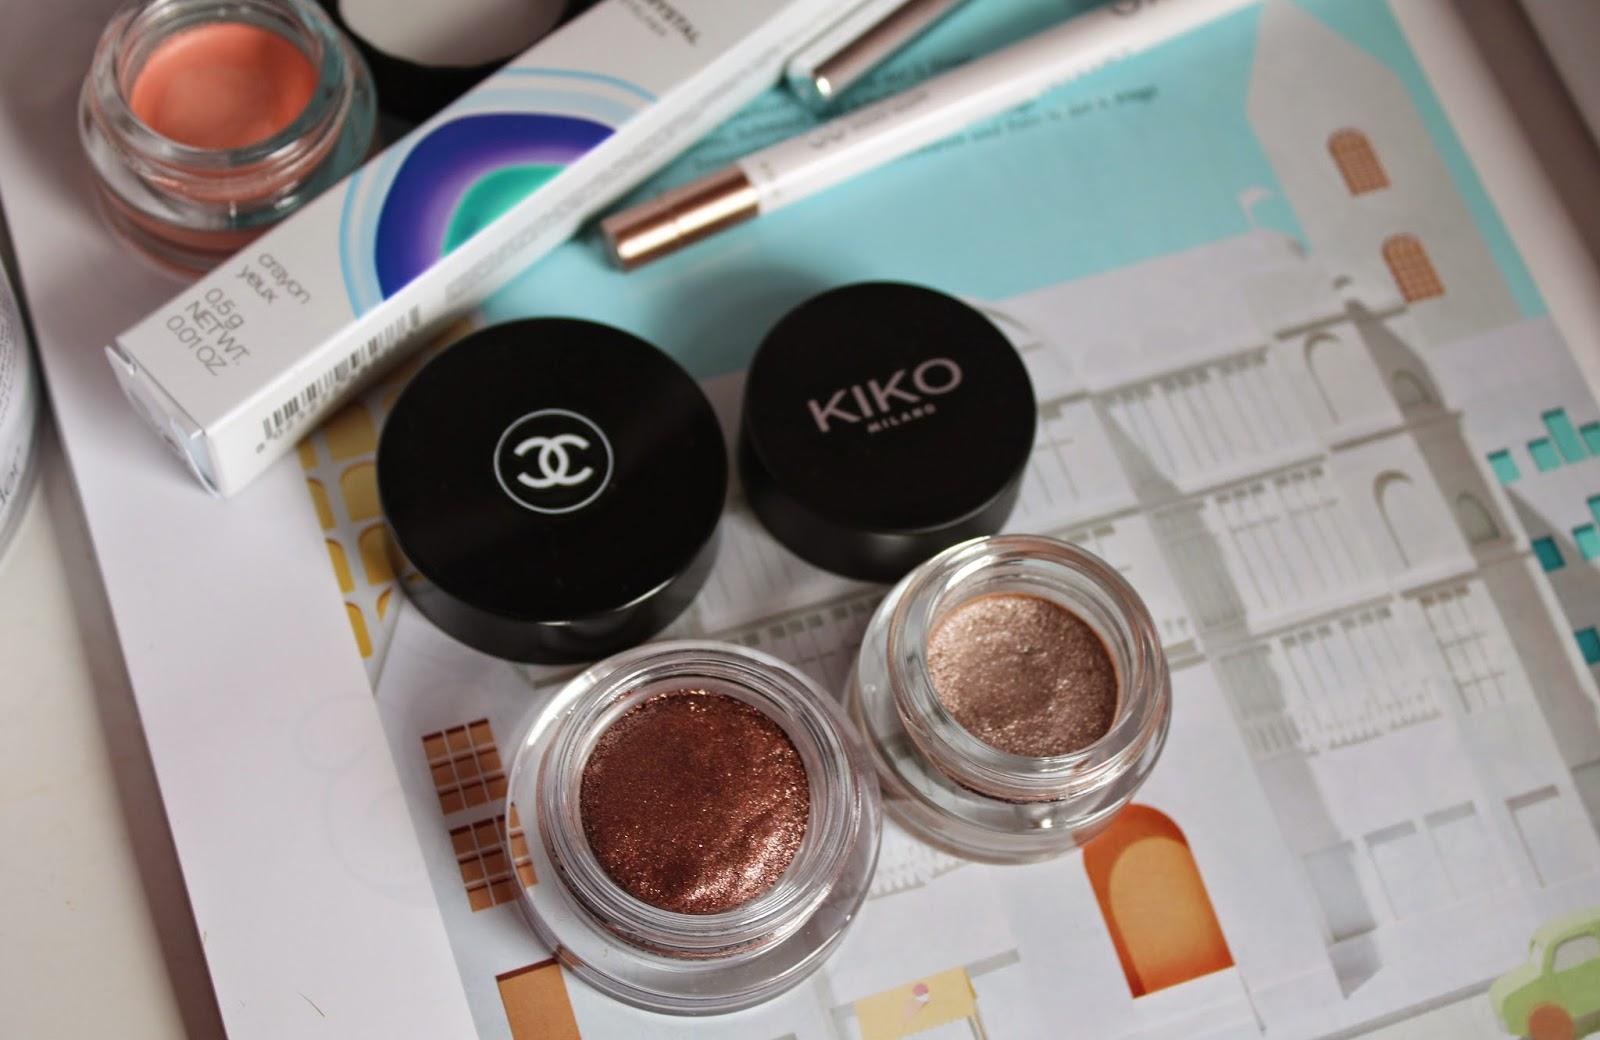 Chanel, Kiko cream eyeshadows